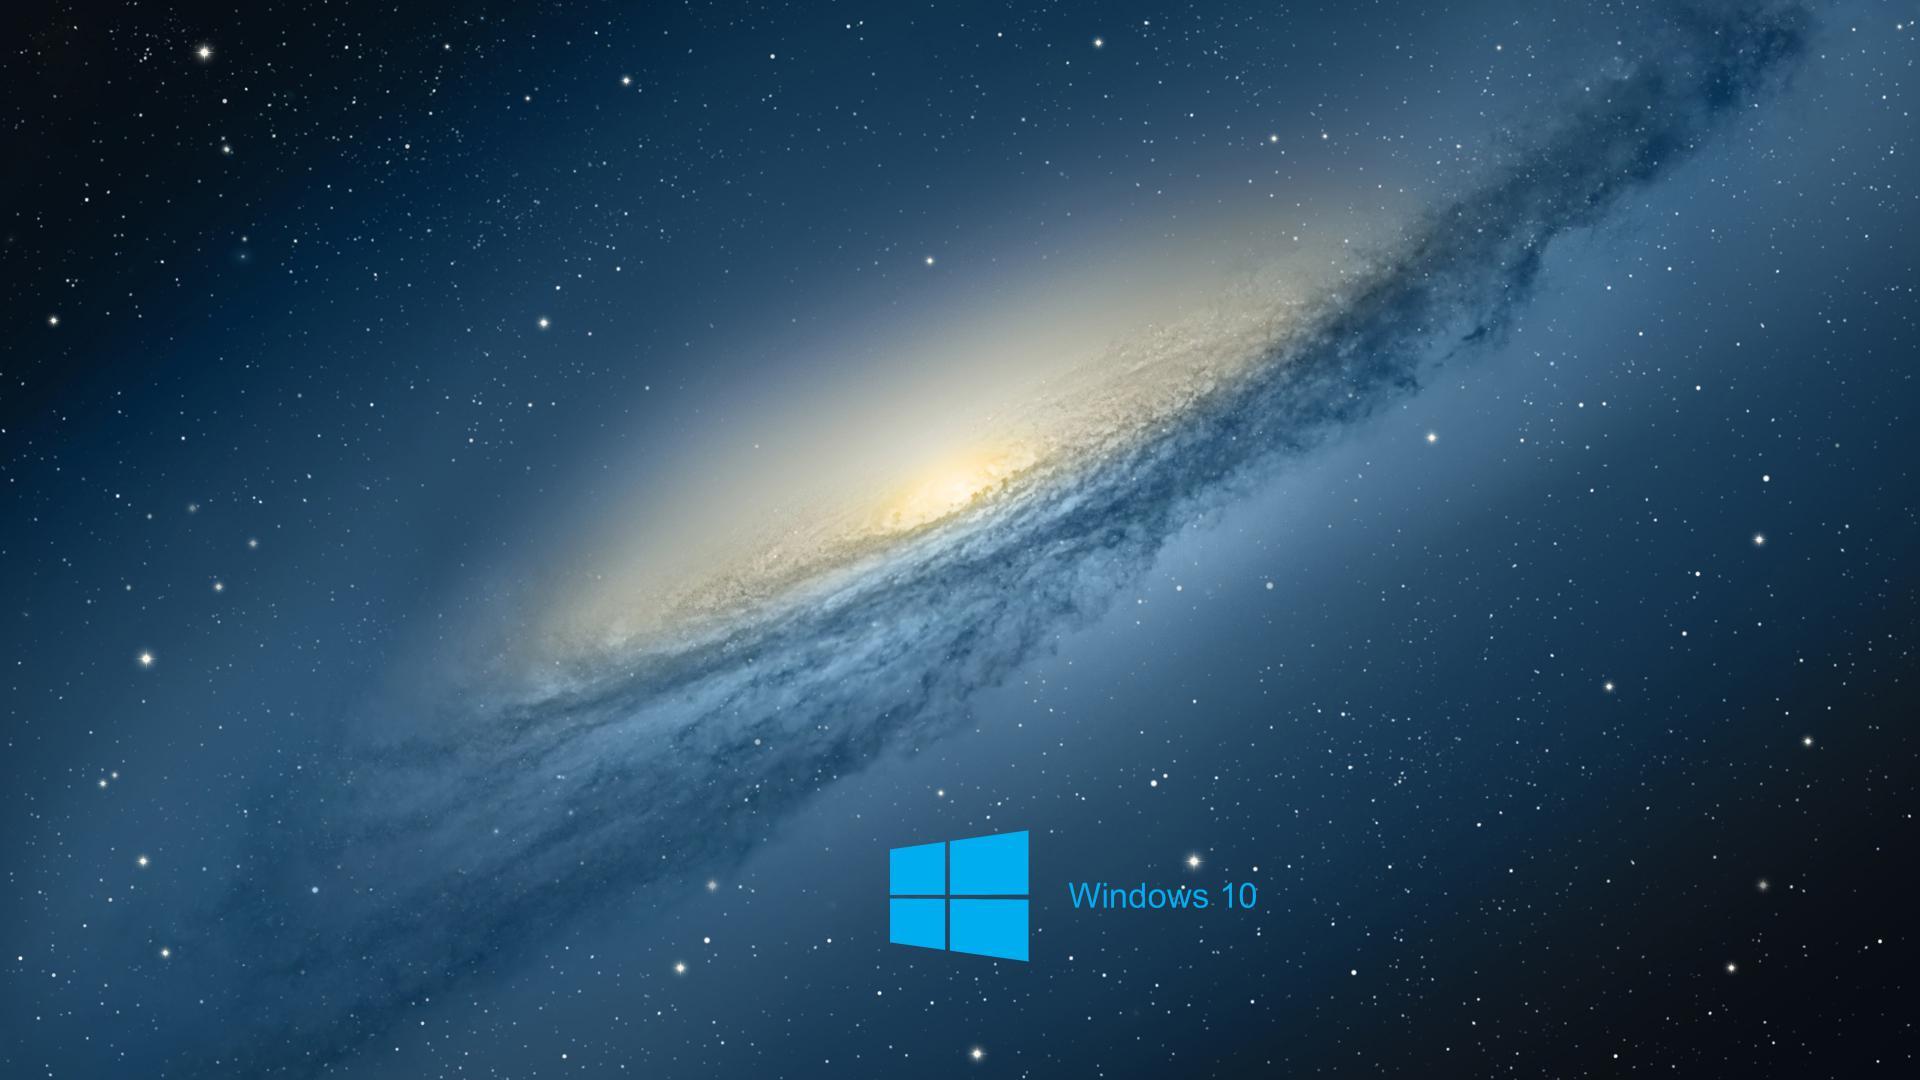 Hd wallpaper windows 10 - Windows 10 Desktop Wallpaper With Scientific Space Planet Galaxy Stars